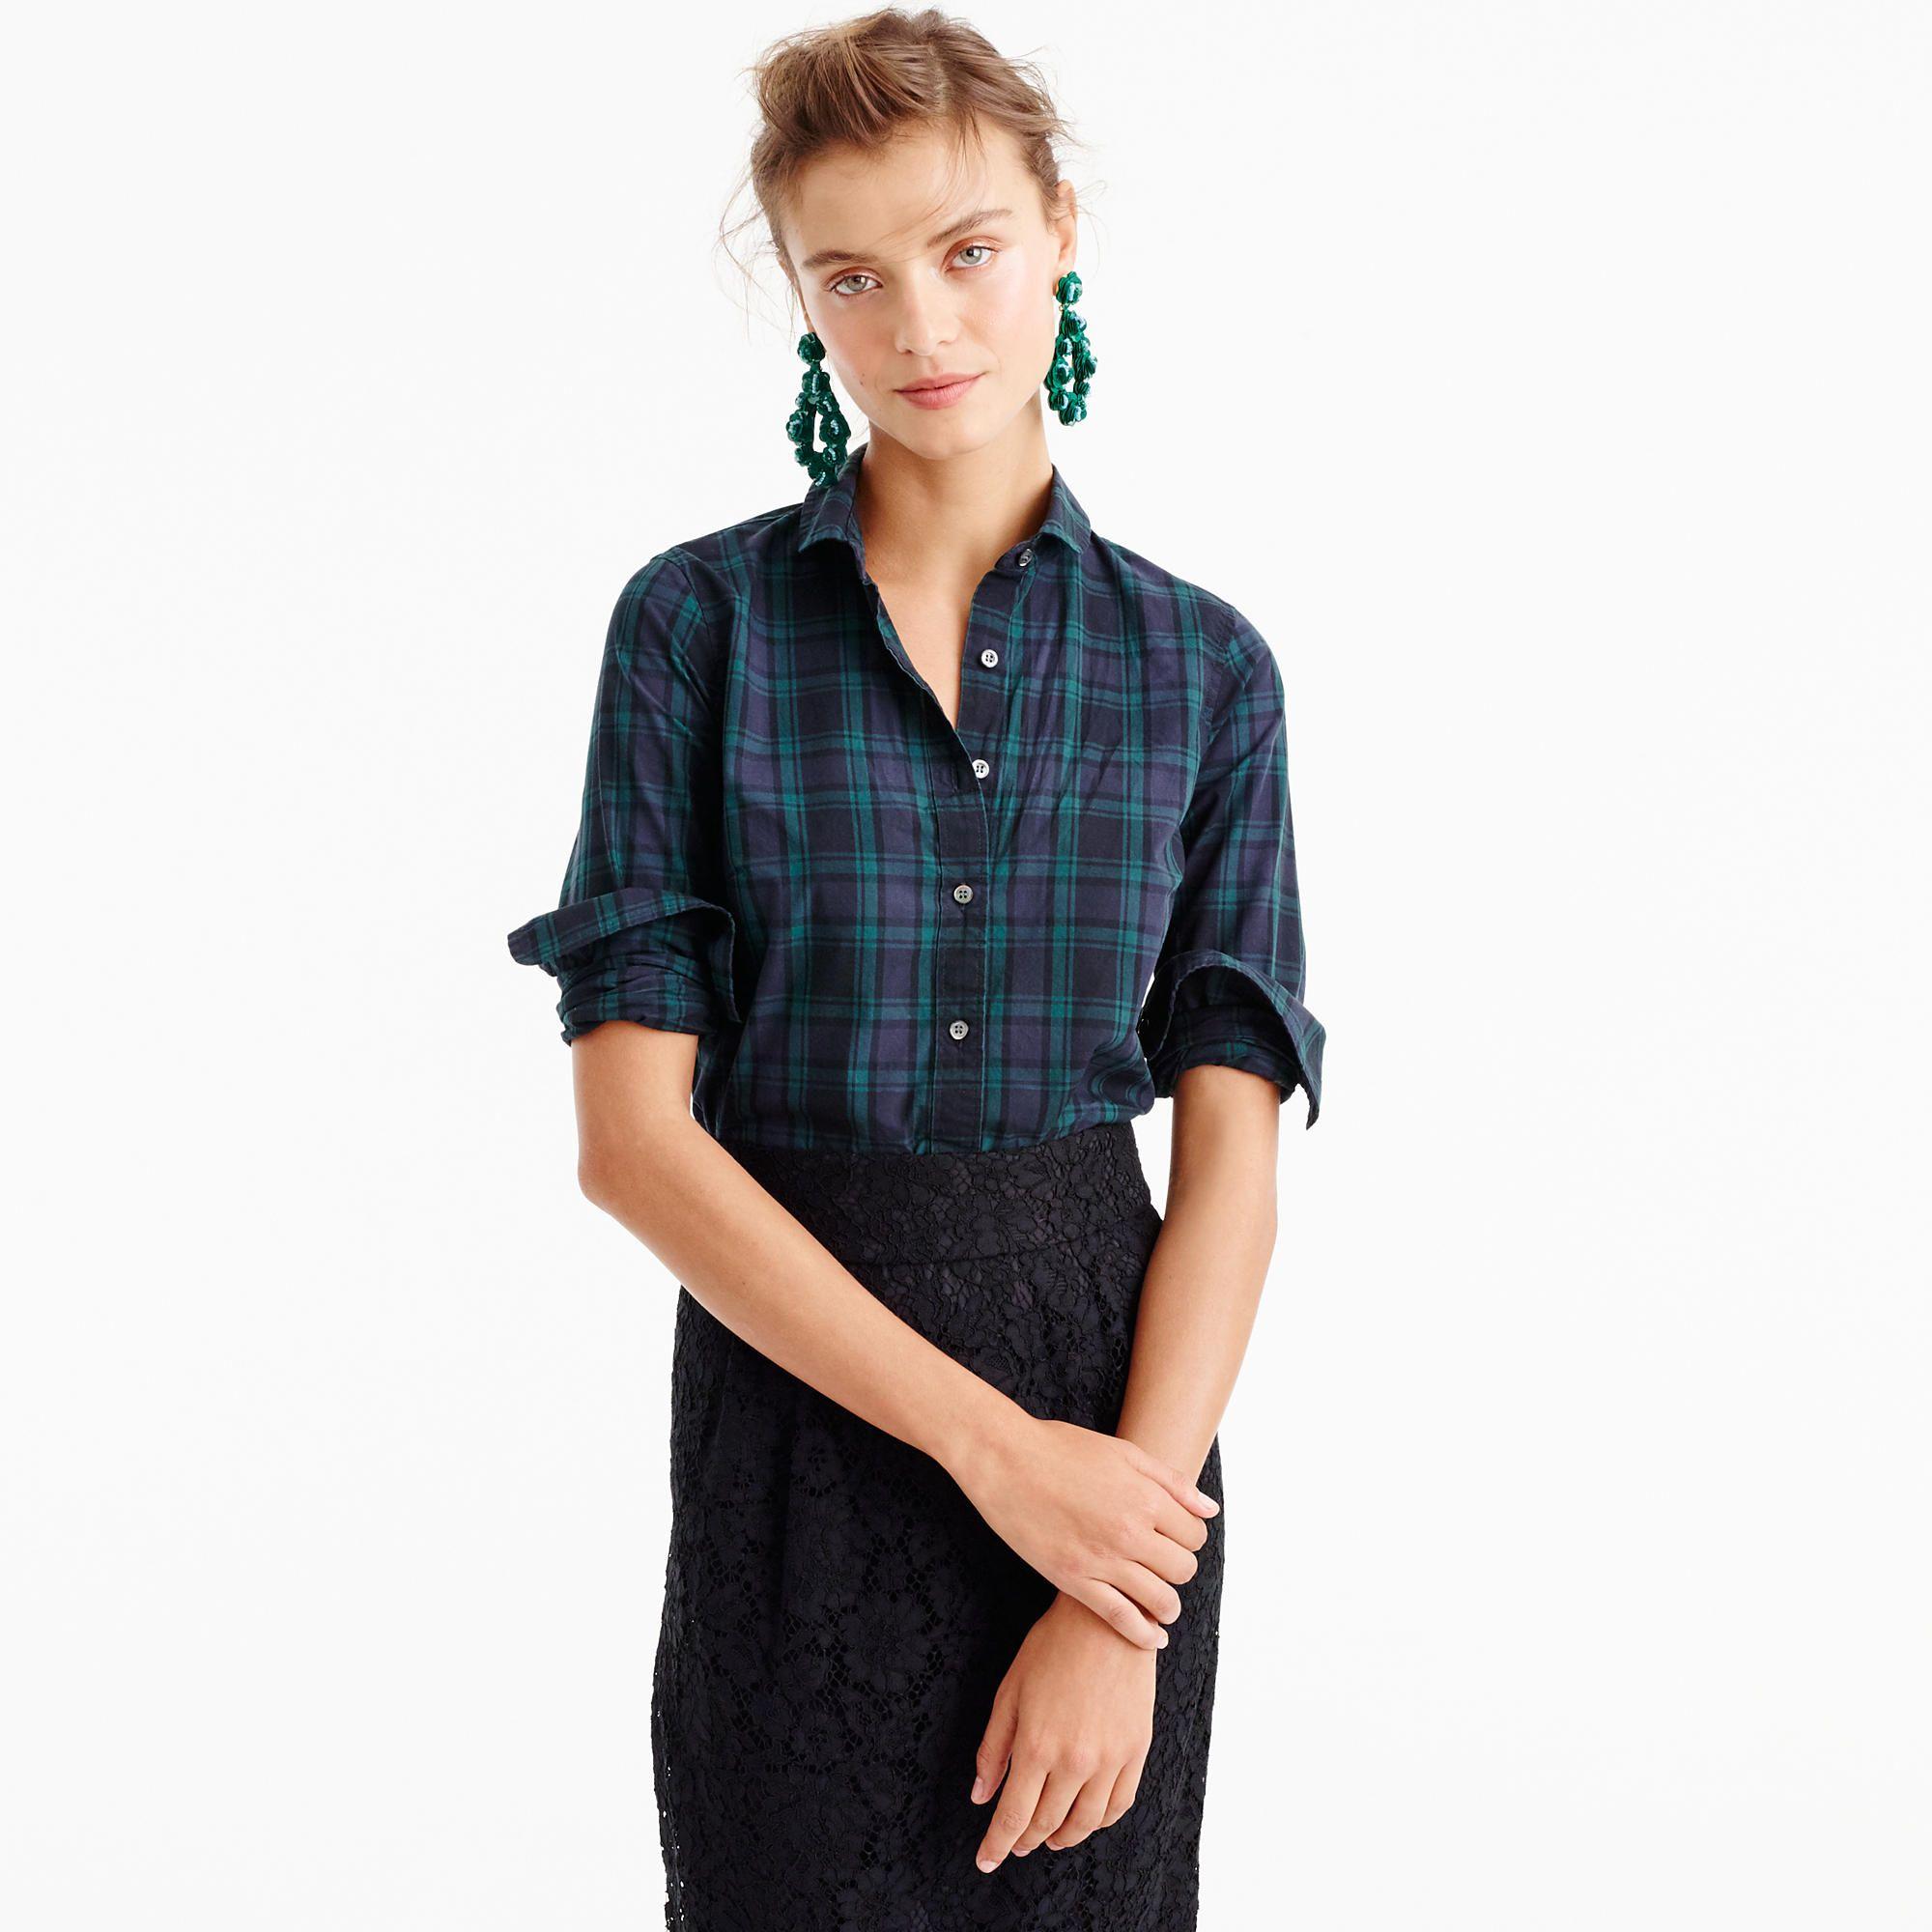 b19aa2ec974202 Club-Collar Perfect Shirt In Black Watch Plaid   Women s Shirts